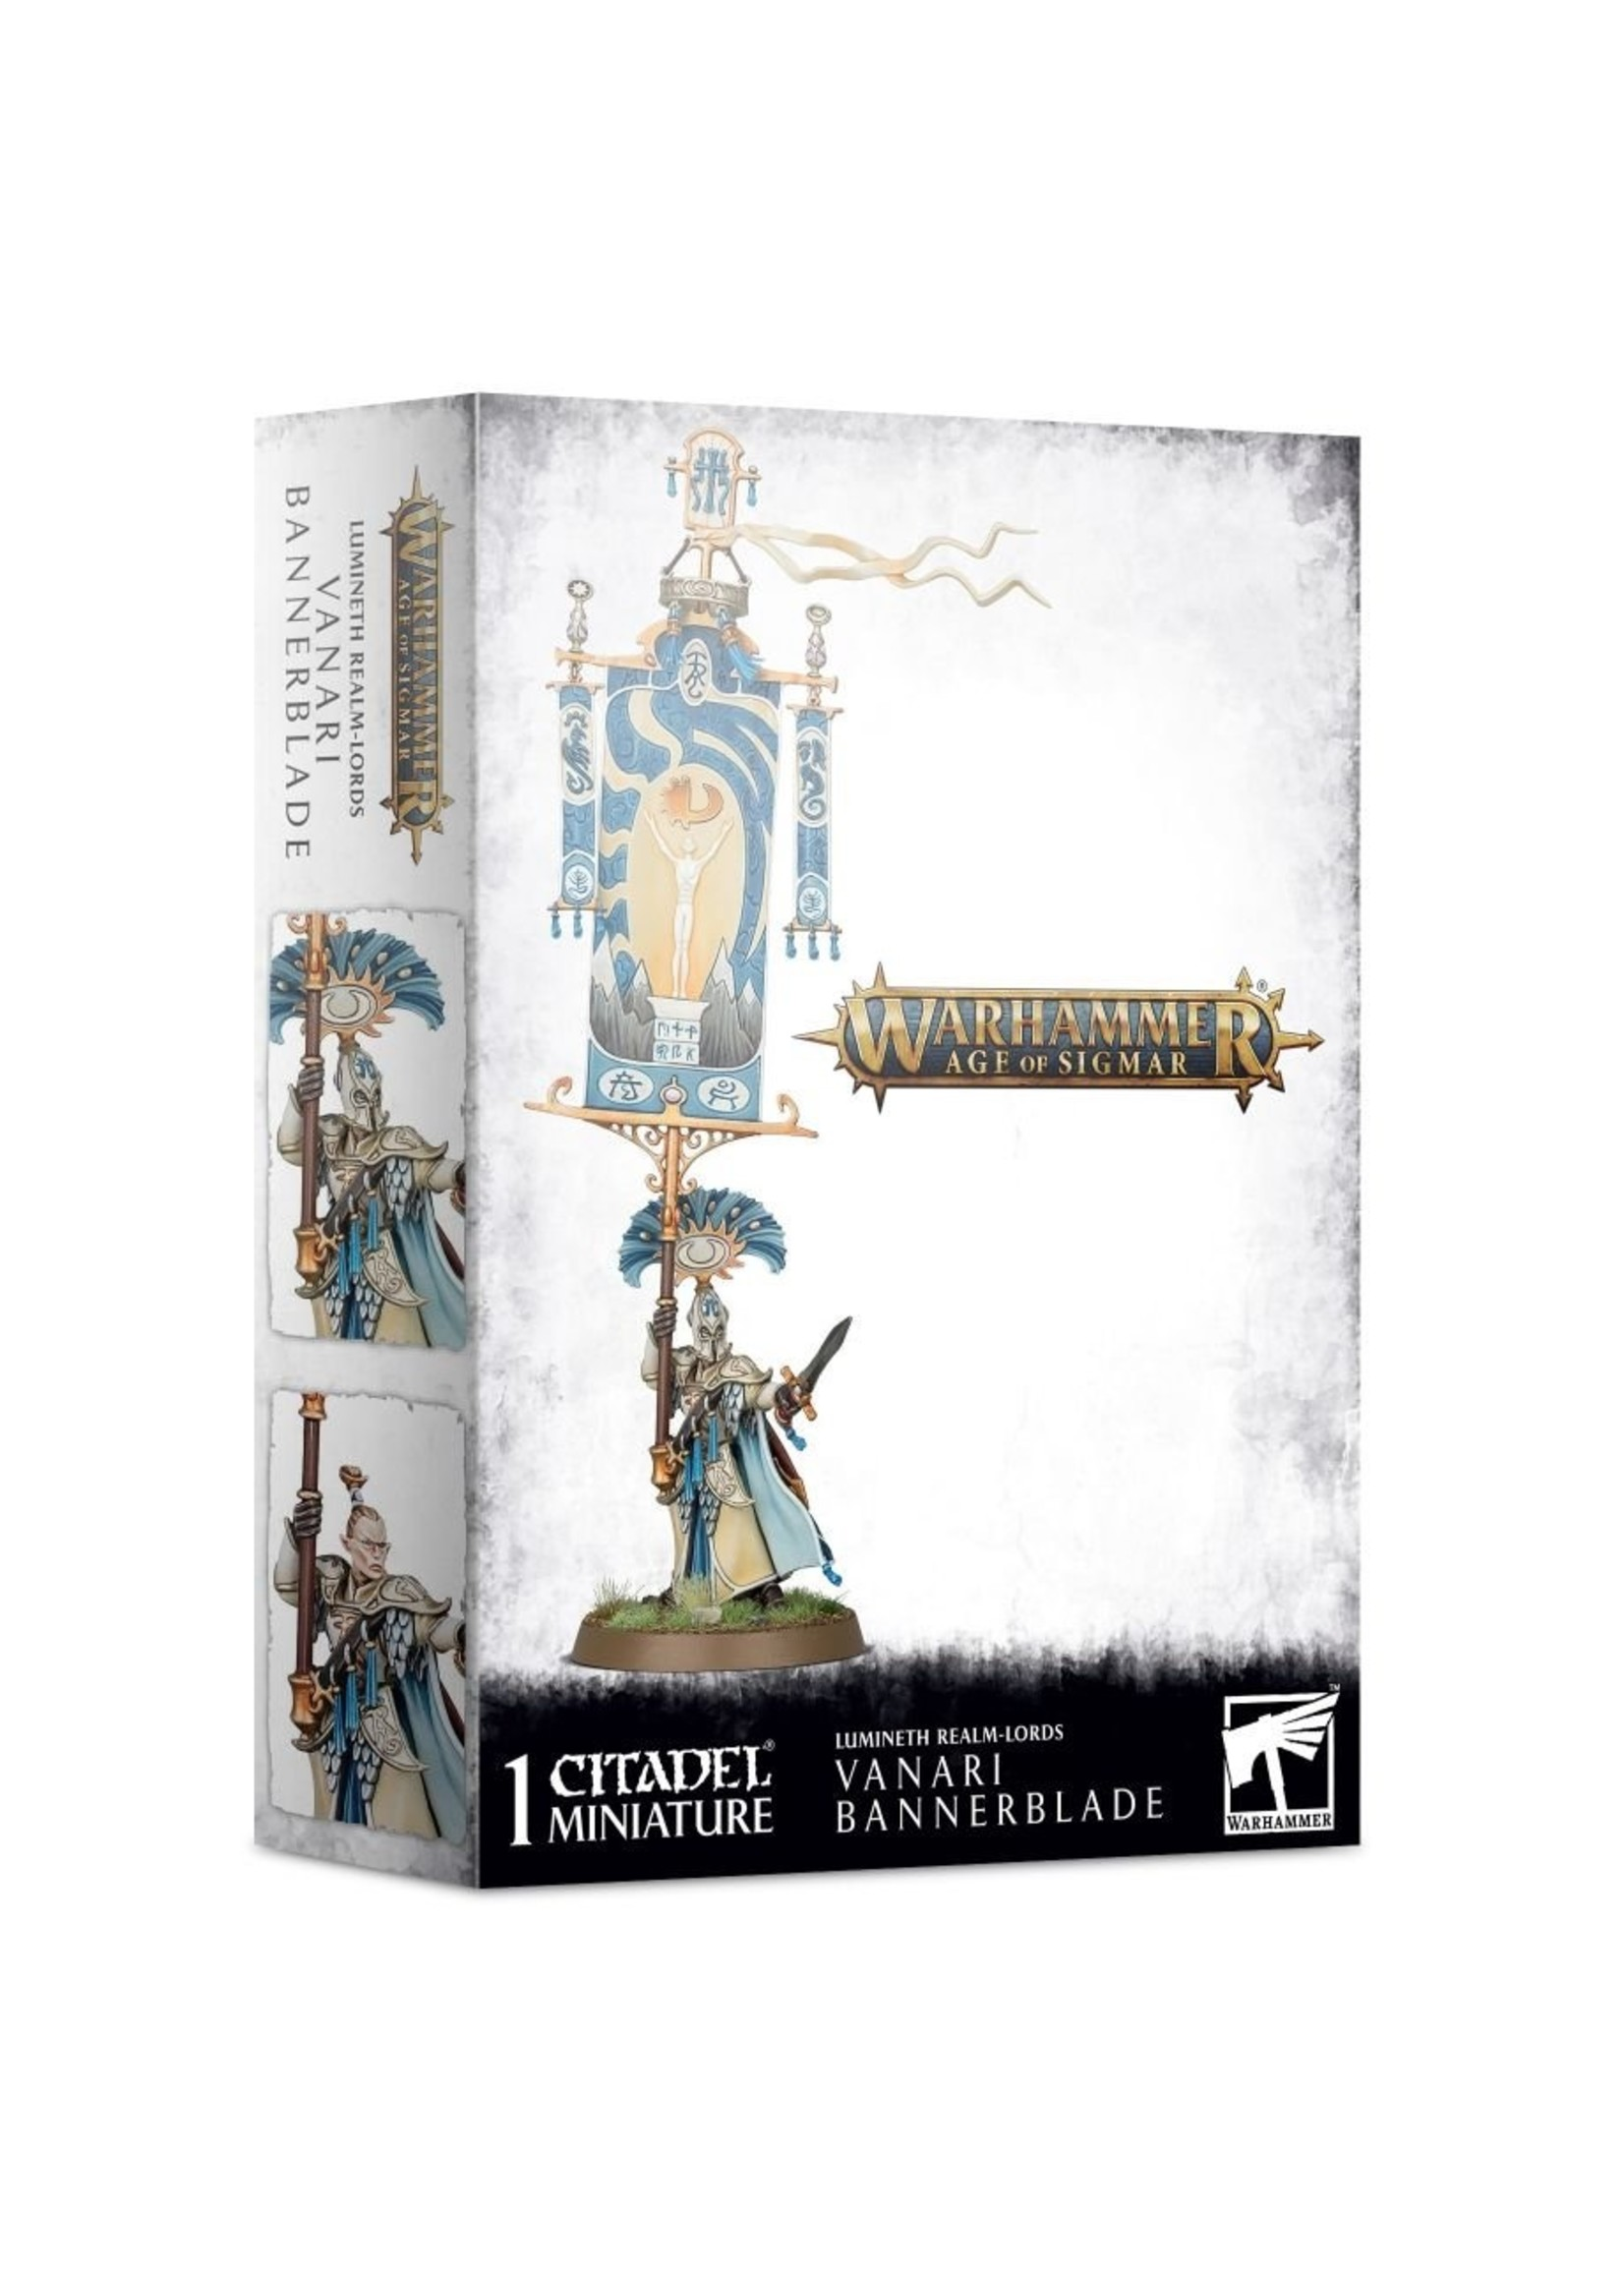 Warhammer Age of Sigmar: Lumineth Realm-Lords Vanari Bannerblade